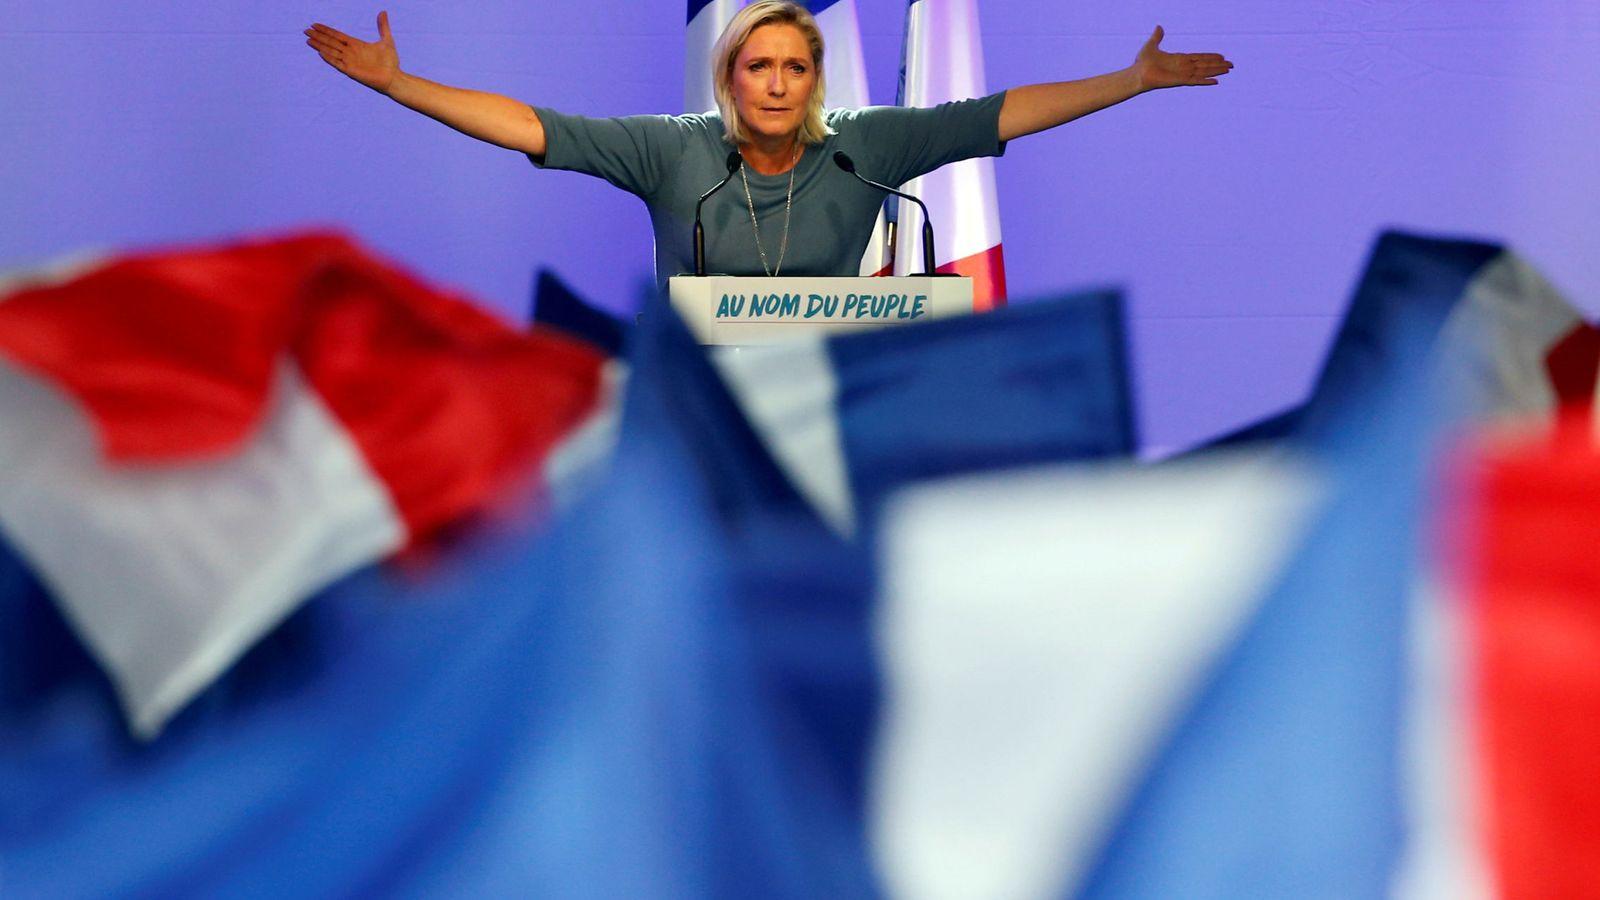 Foto: La líder del Frente Nacional, Marine Le Pen. (Reuters)